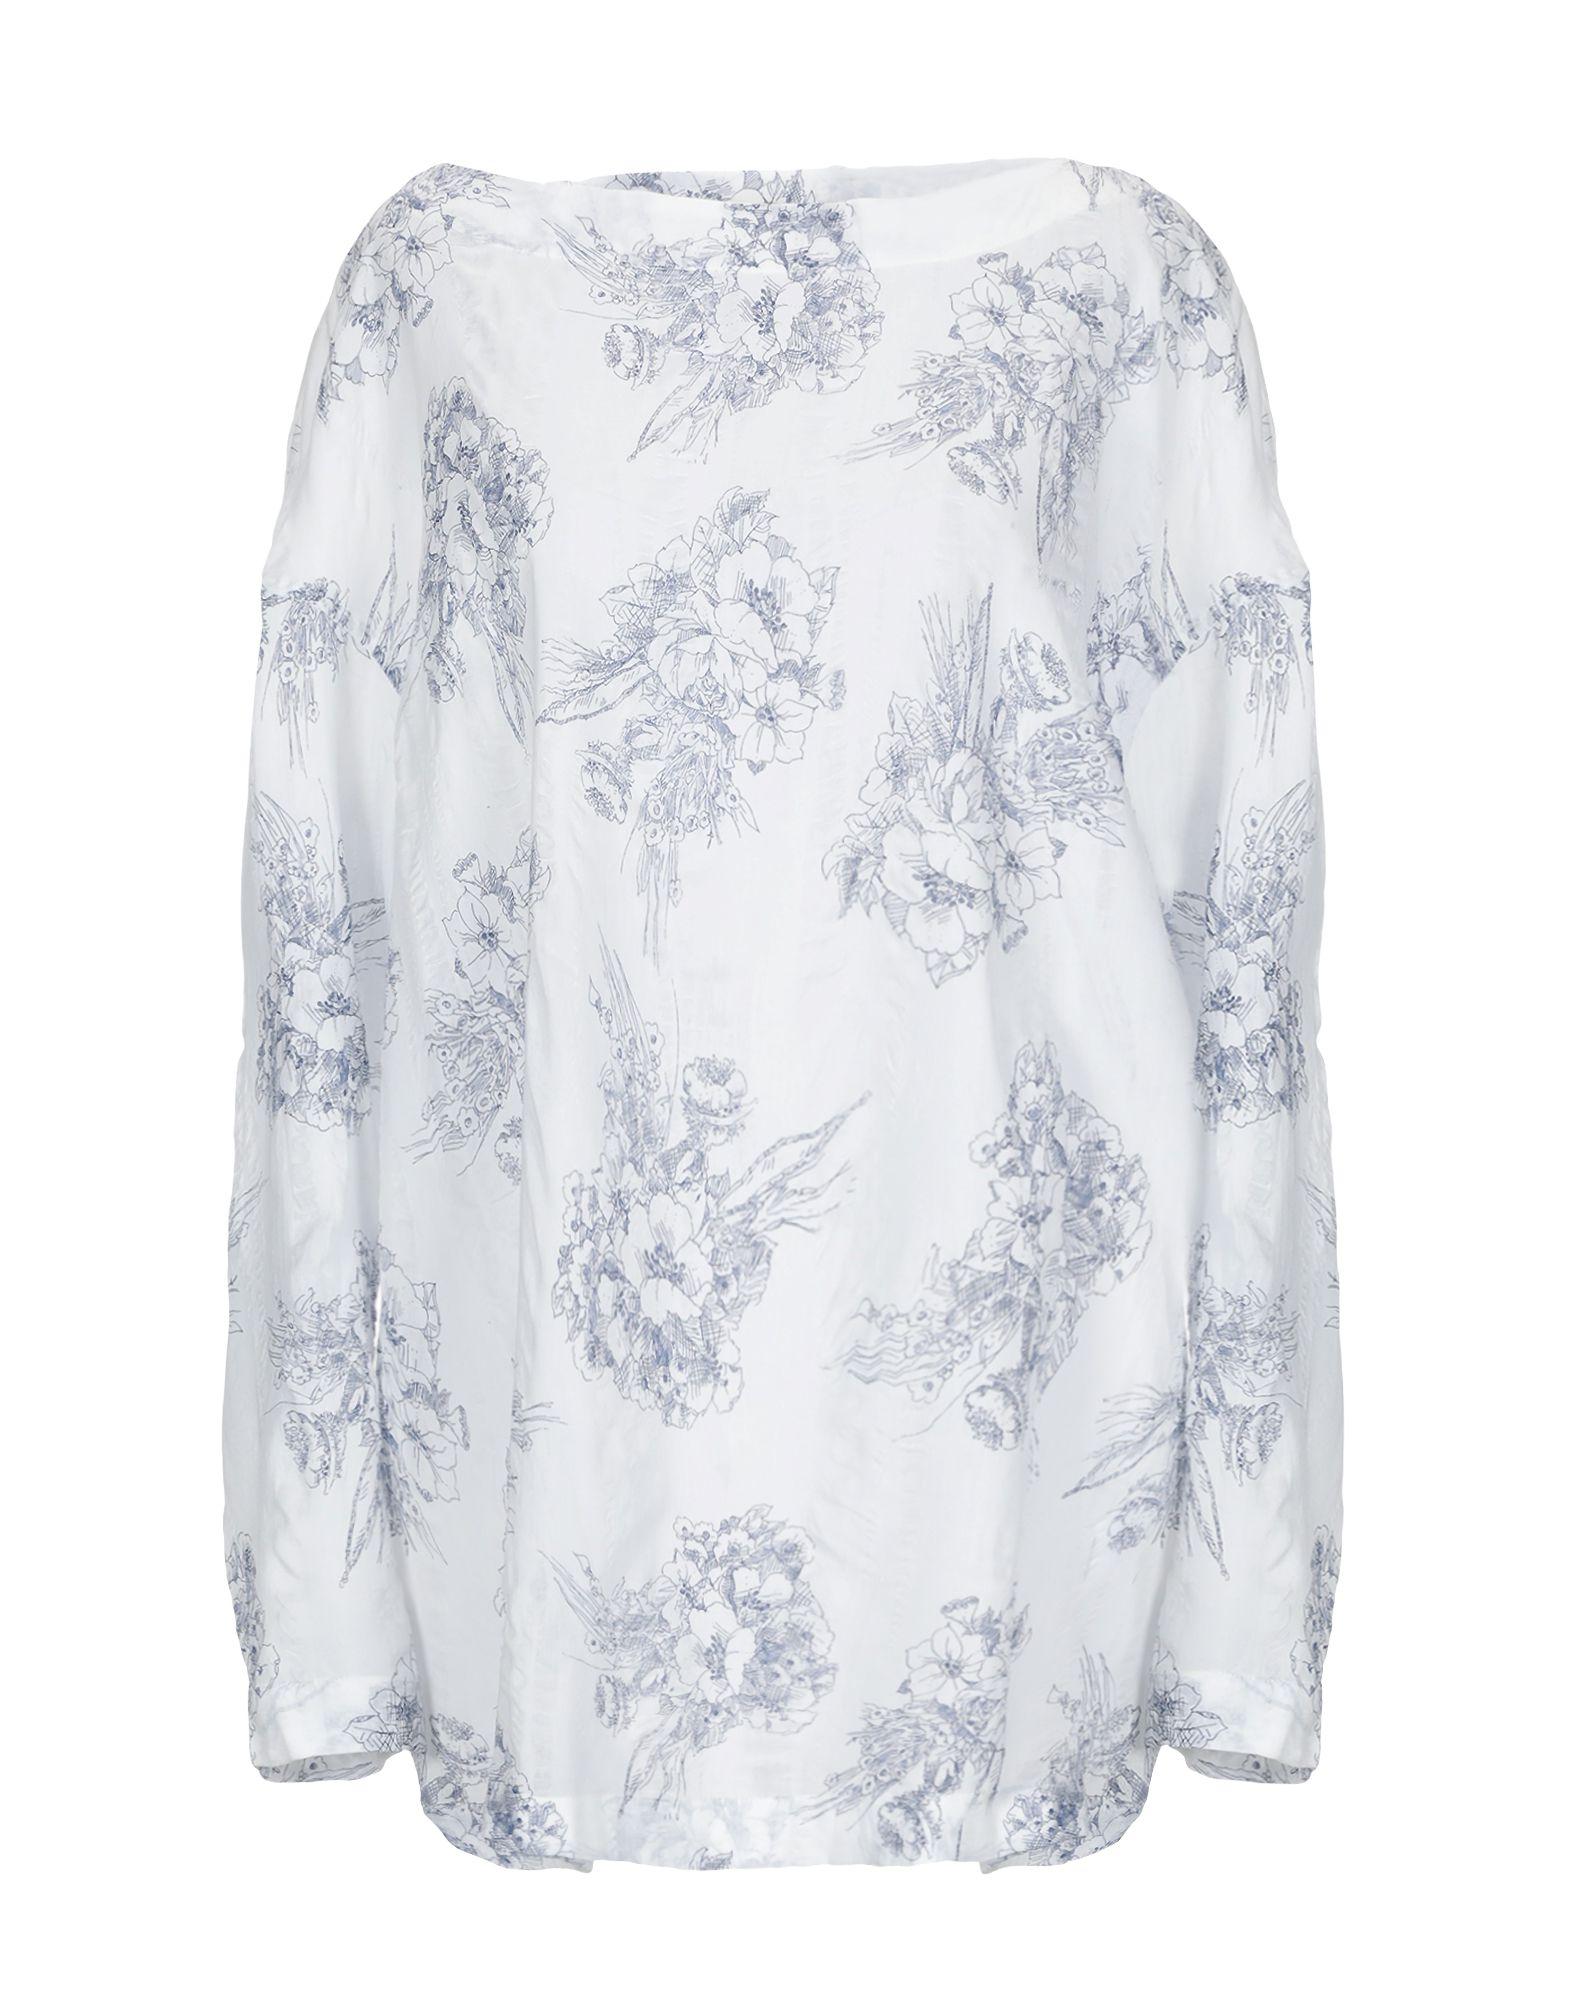 MASSIMO ALBA Блузка блузка alba moda klingel цвет серый рисунок